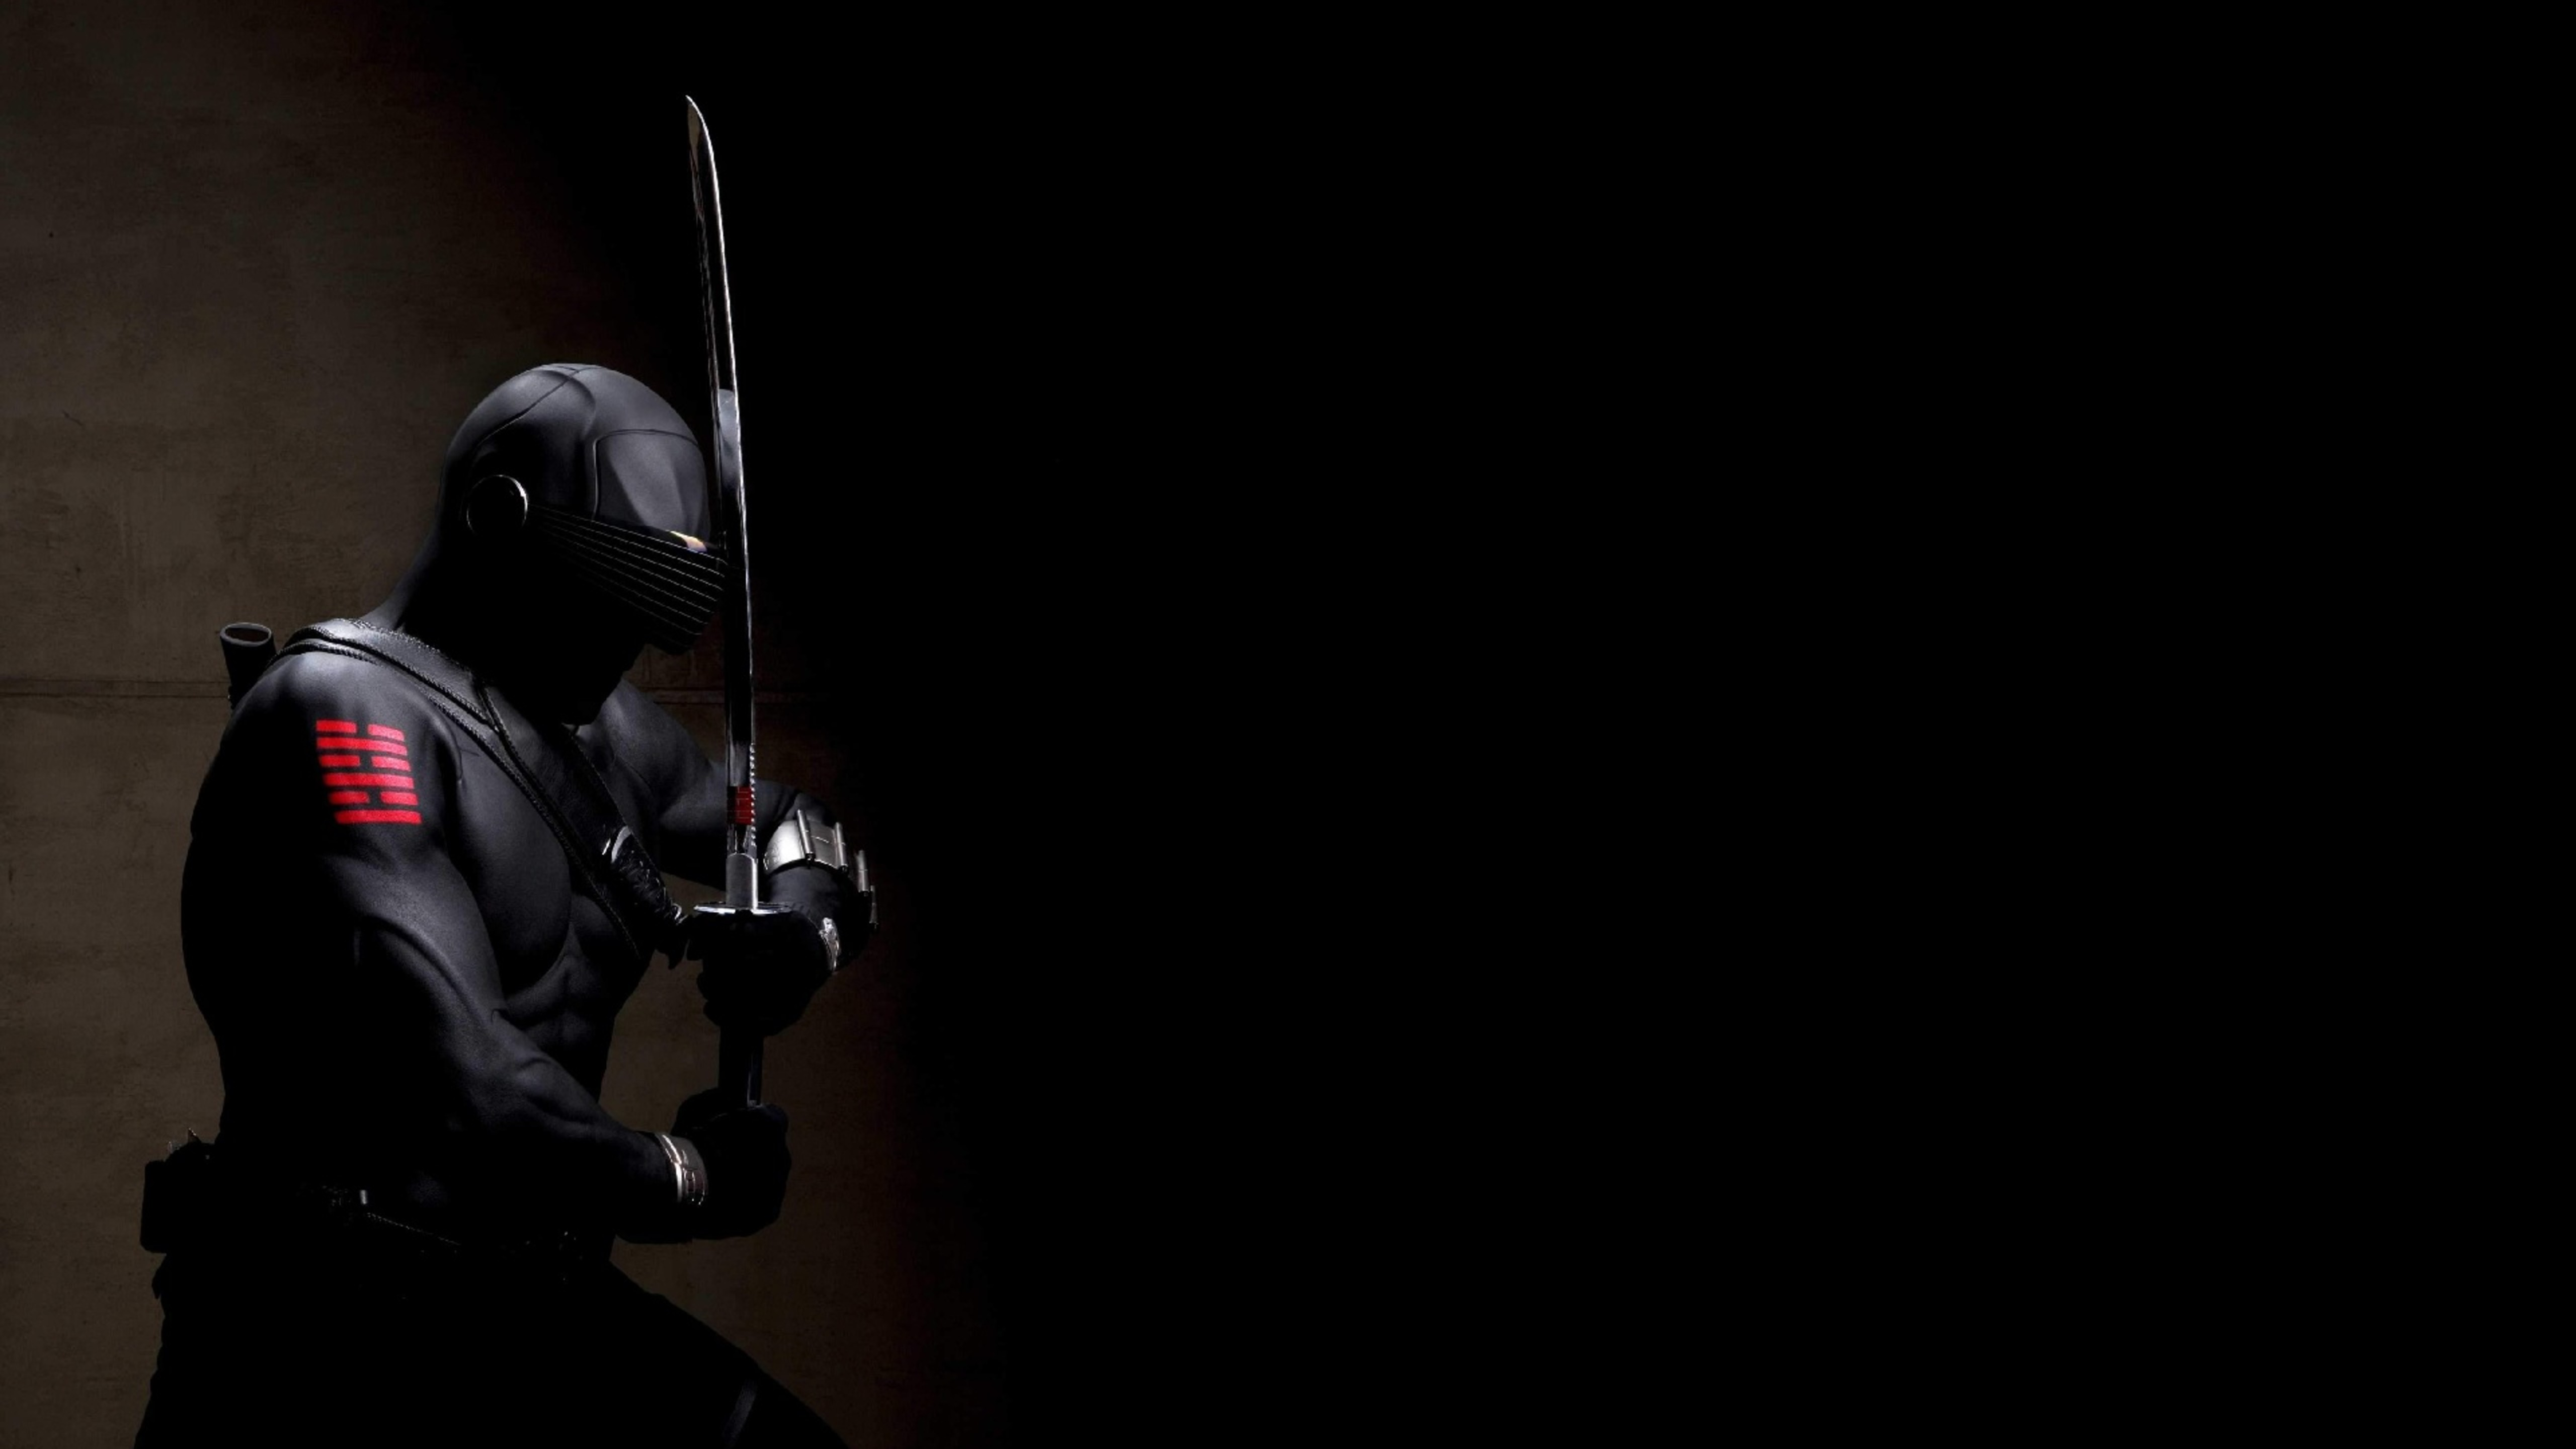 Shadow Ninja Snake Eyes Wallpaper Download 5120x2880 5120x2880